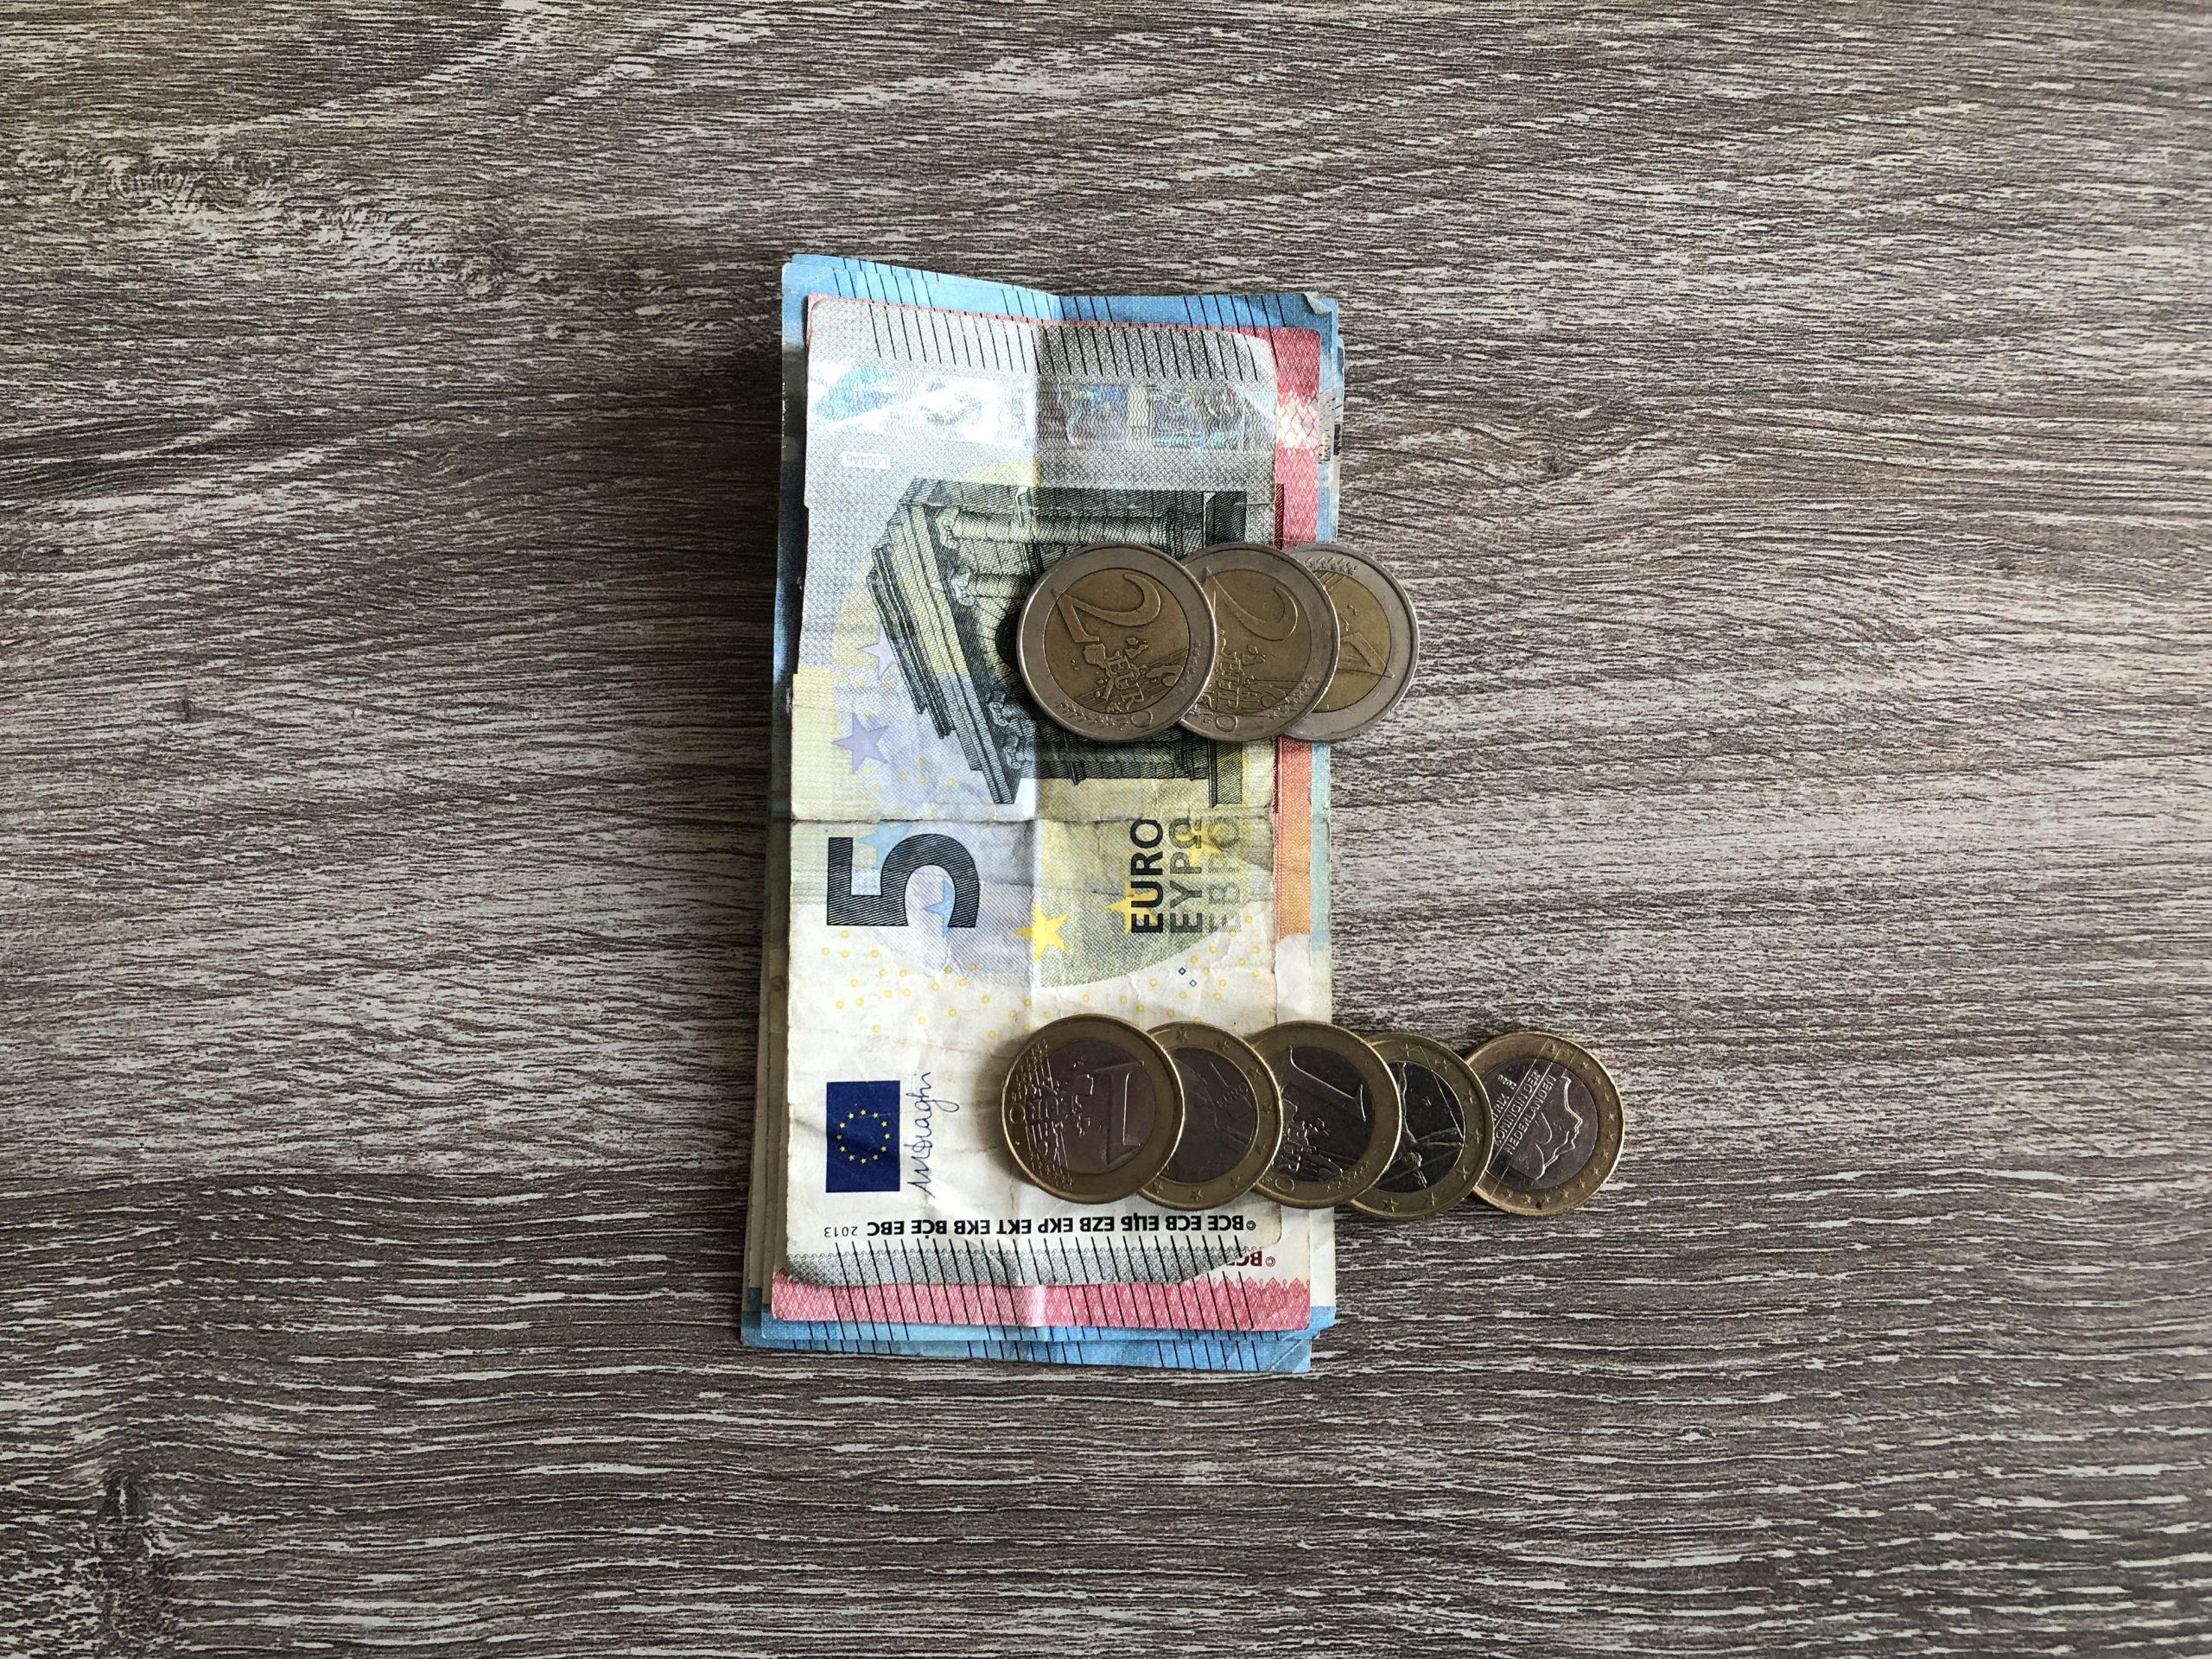 Hoe ik ruim 1600 euro verdeelde